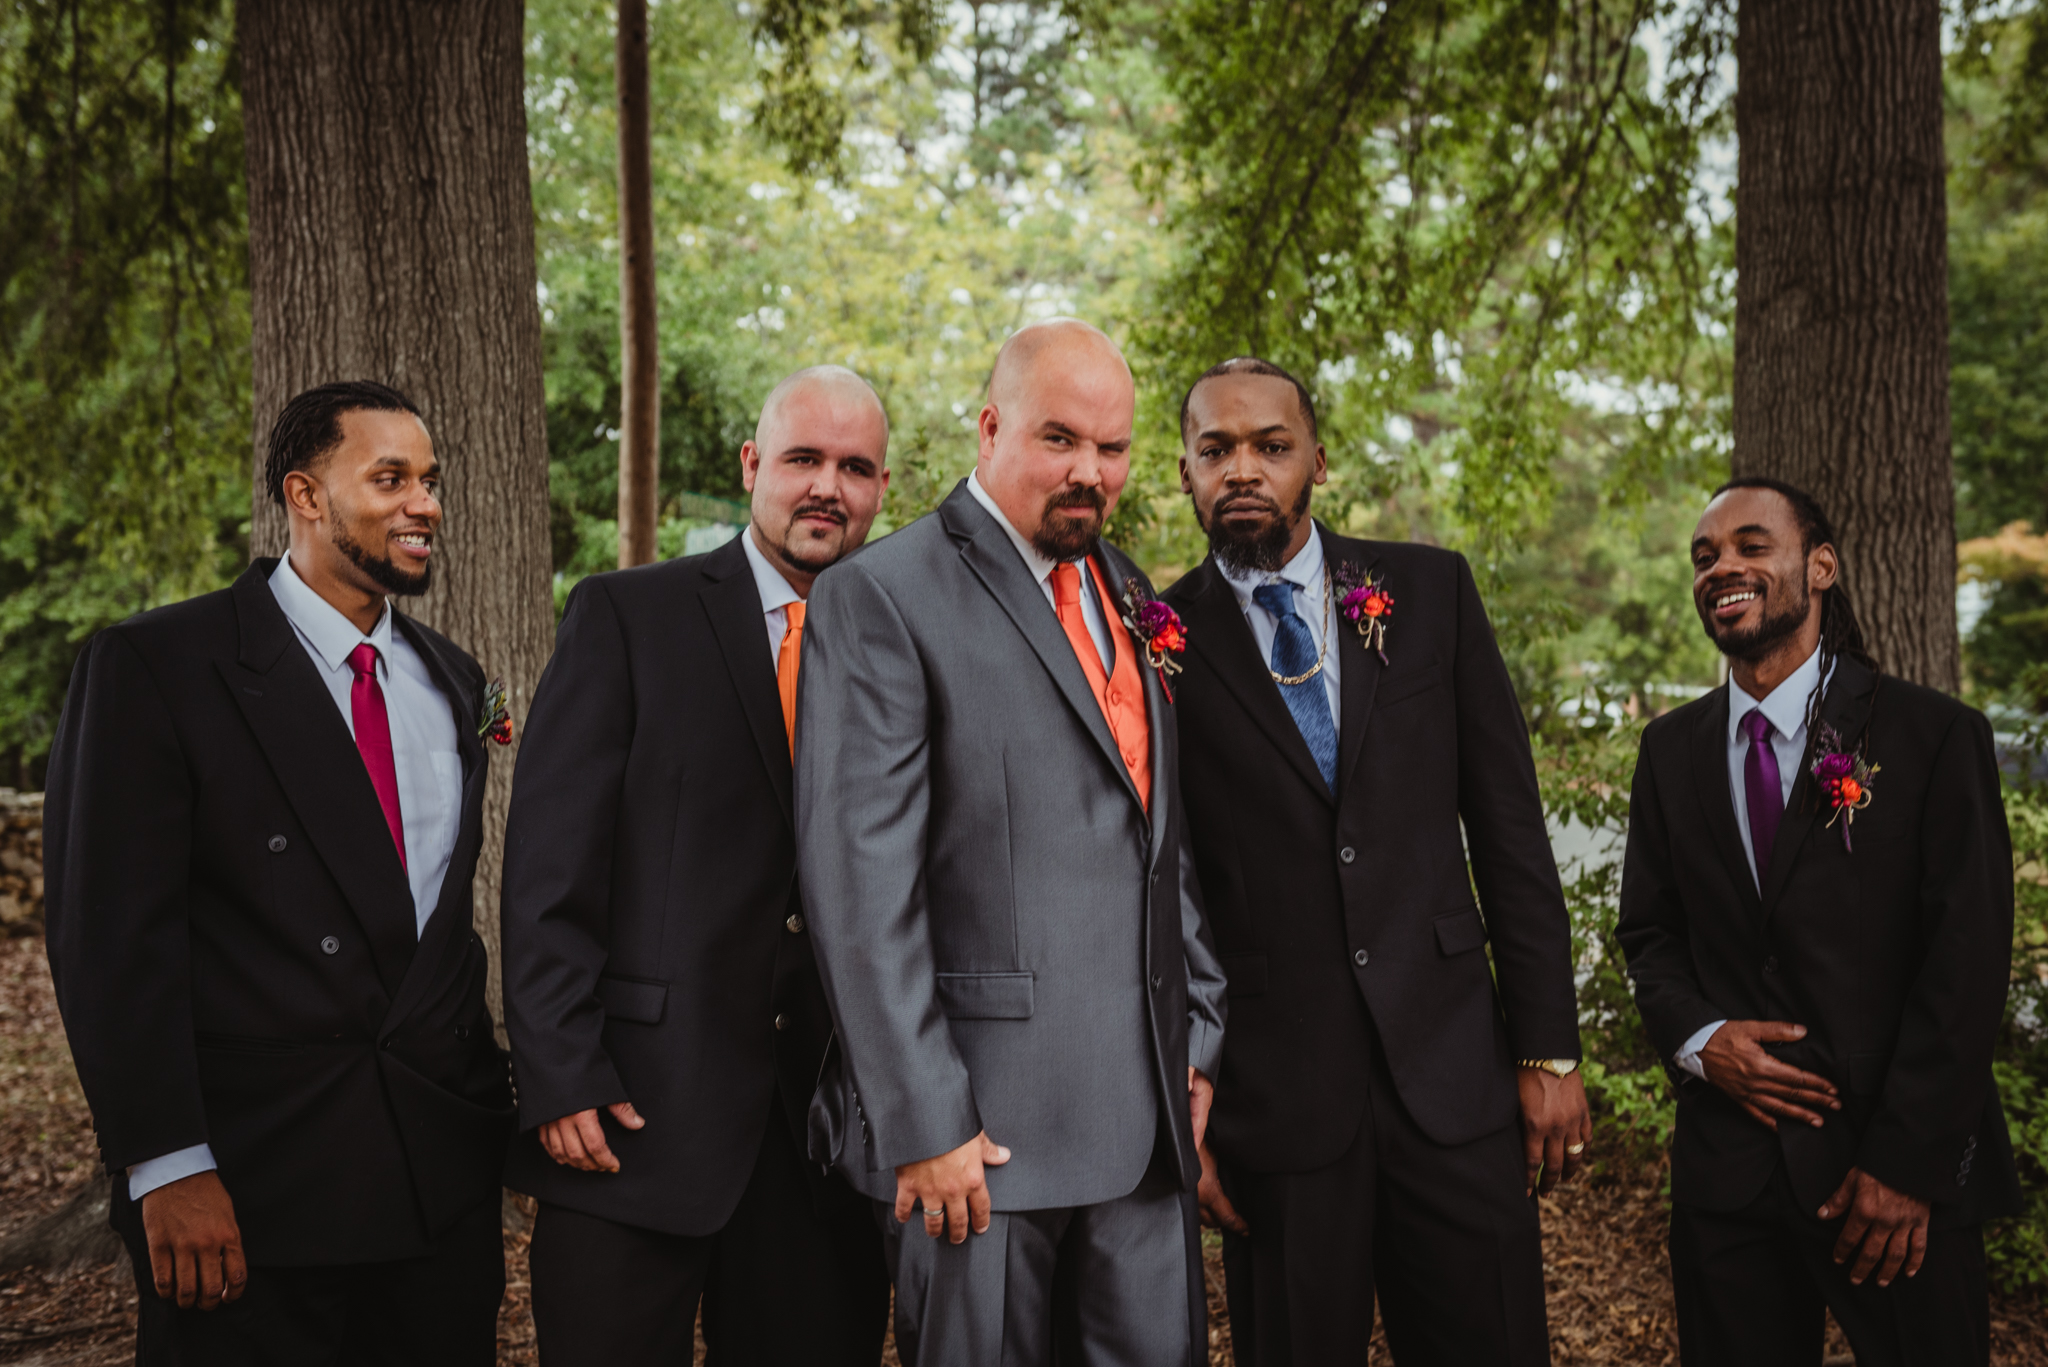 raleigh-wedding-groomsmen-portraits-cd.jpg